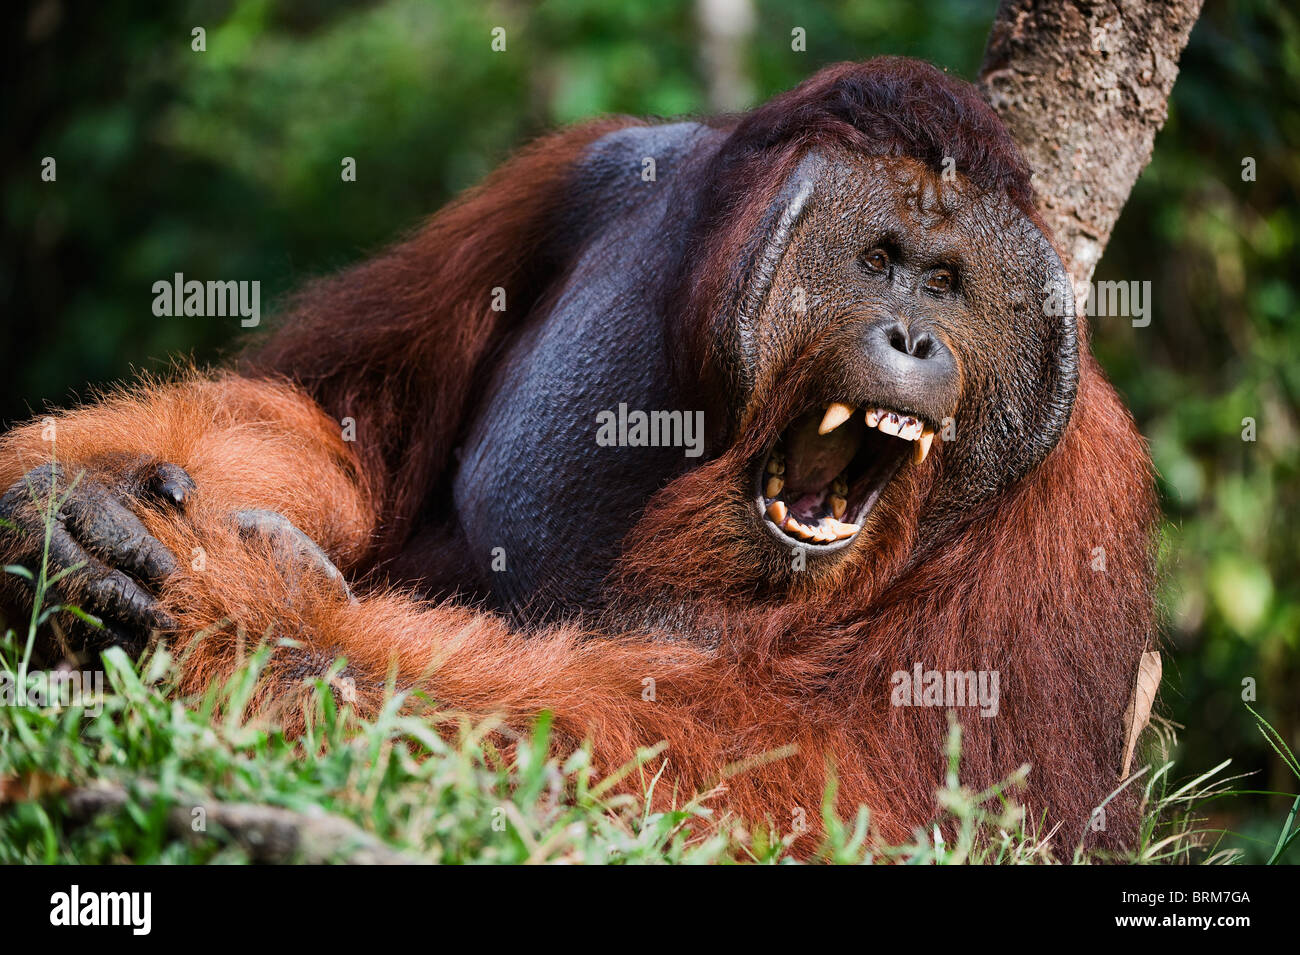 Yawning Orangutan - Stock Image